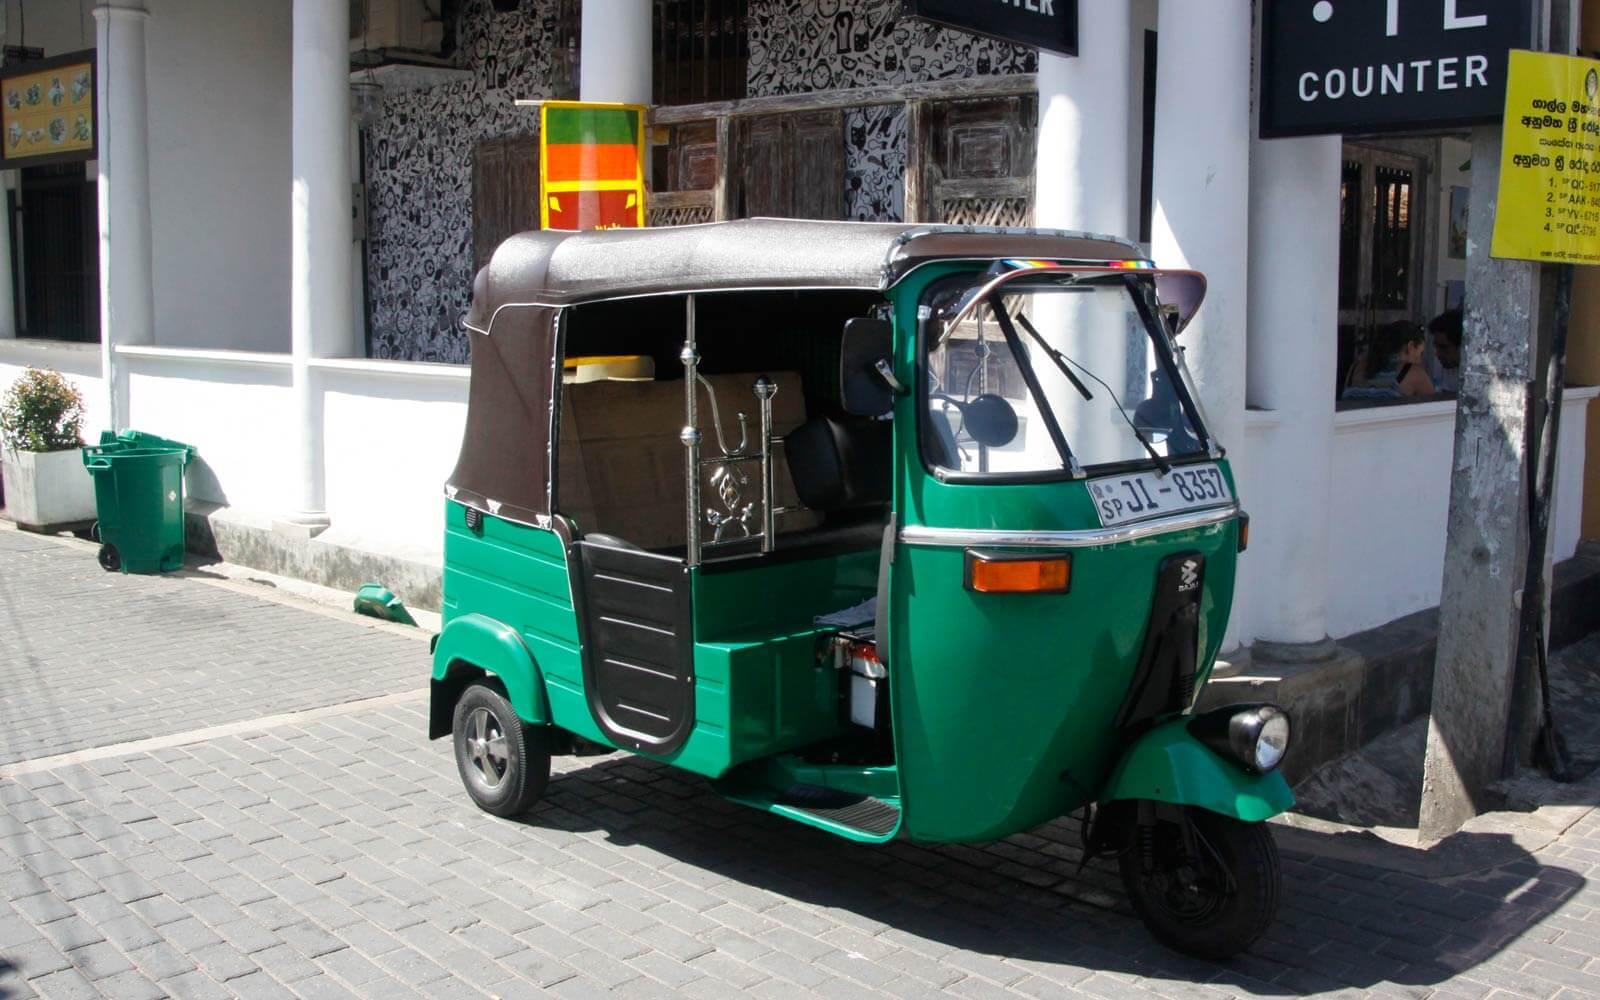 Mit dem Tuktuk zum Projektort fahren